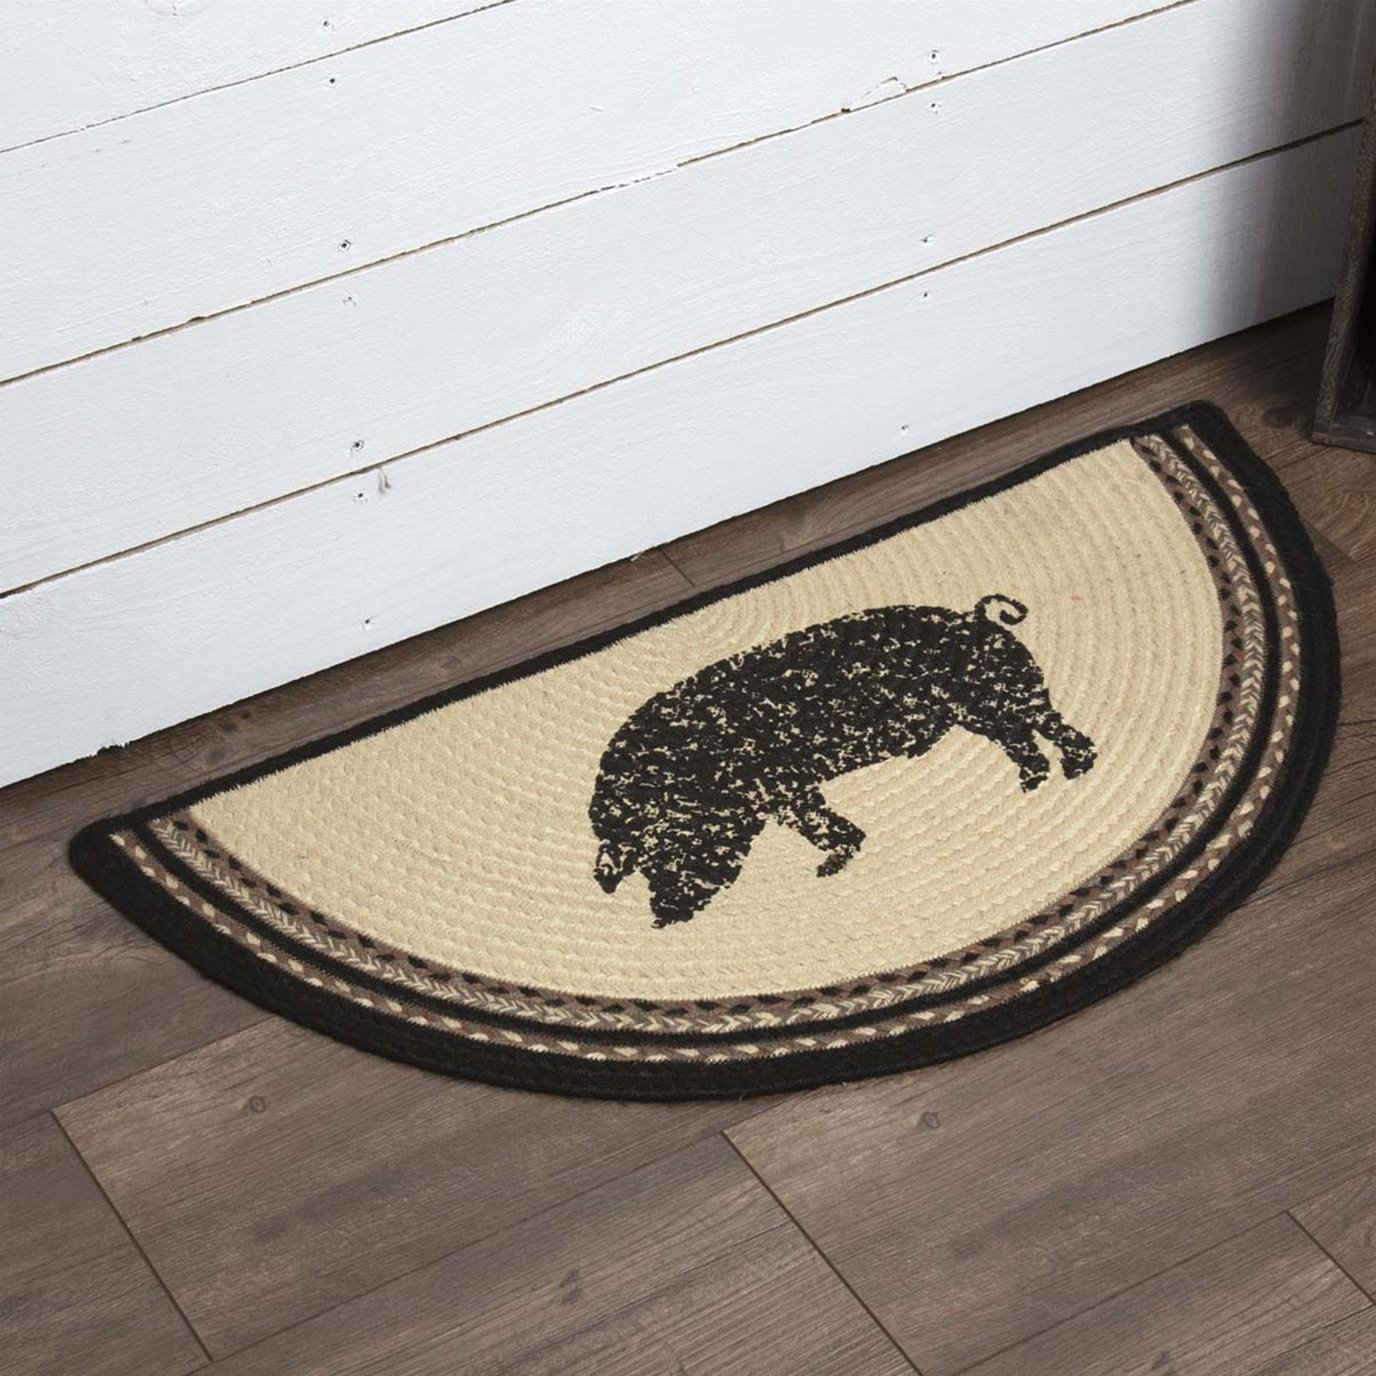 Sawyer Mill Charcoal Pig Jute Rug Half Circle 16.5x33